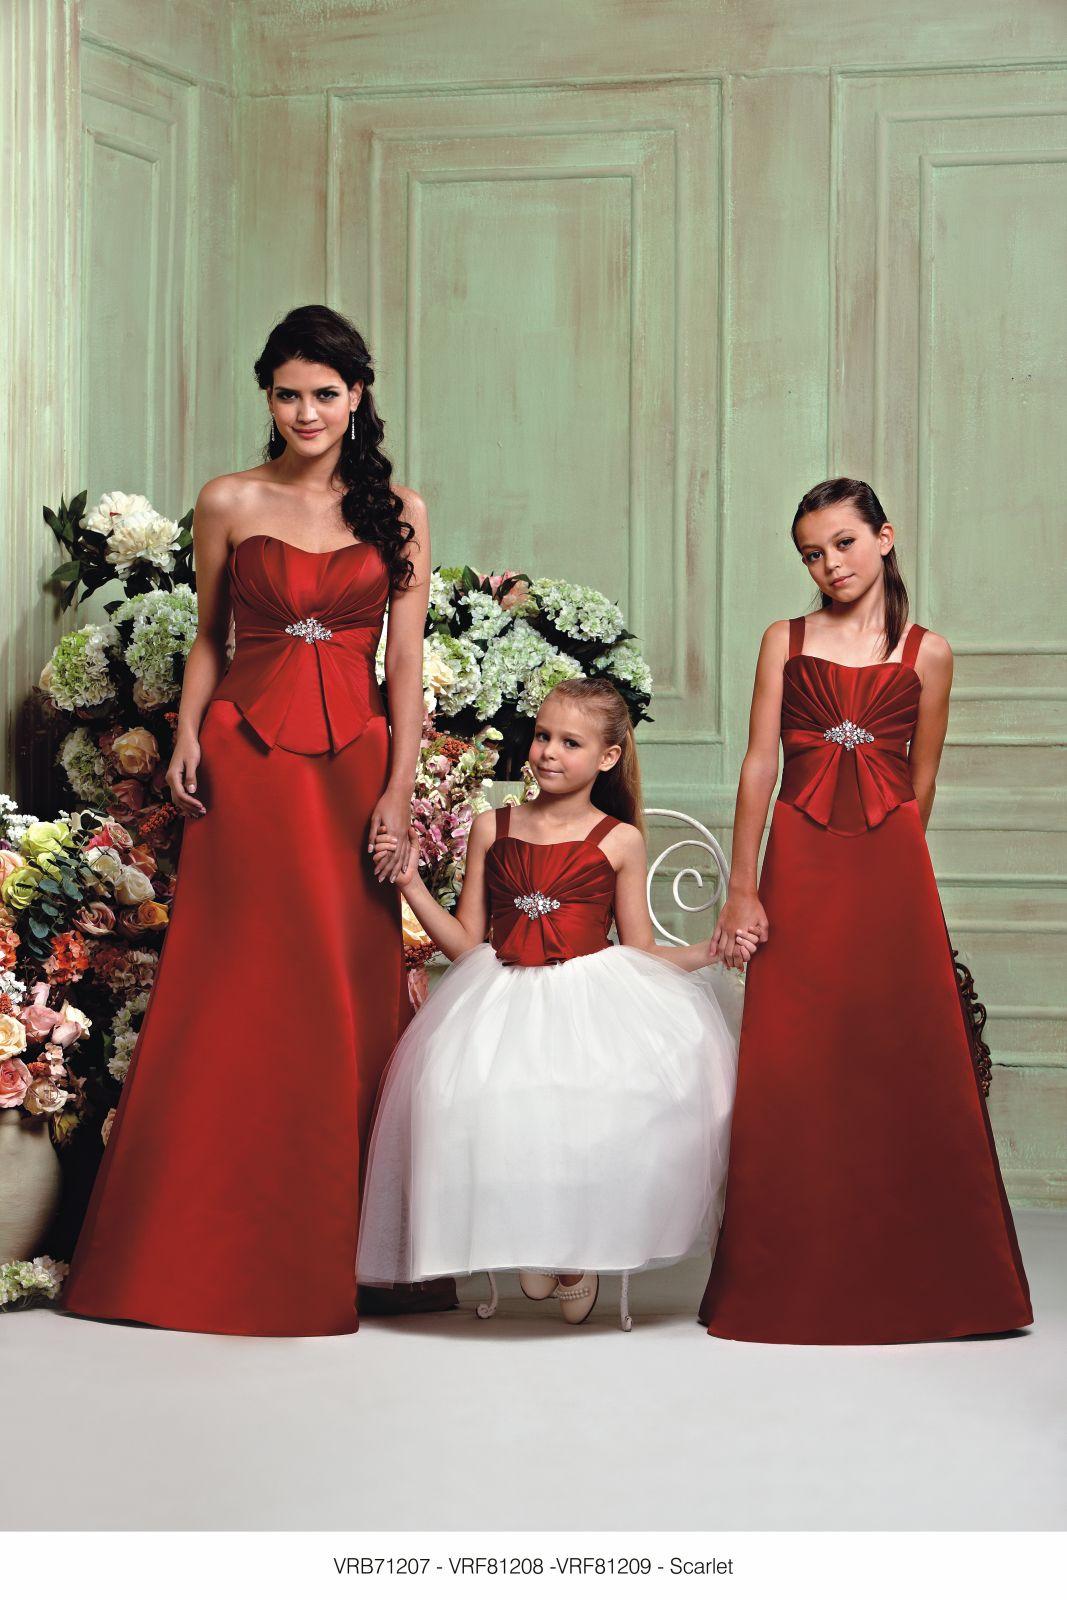 VRB71207/VRF81208/VRF81209 Scarlet from Veromia Bridesmaids